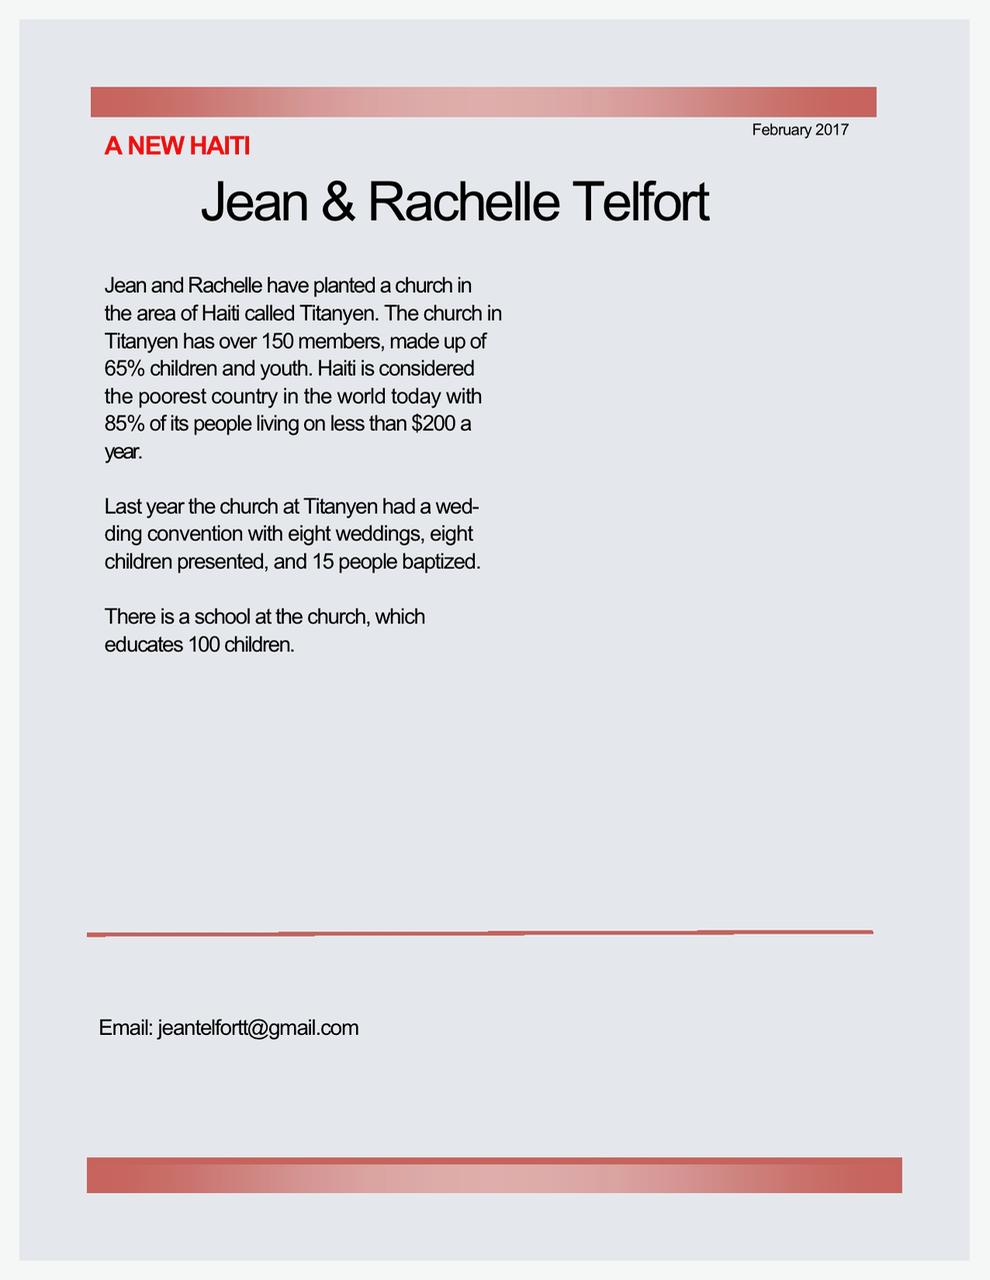 Jean and Rachelle Telfort